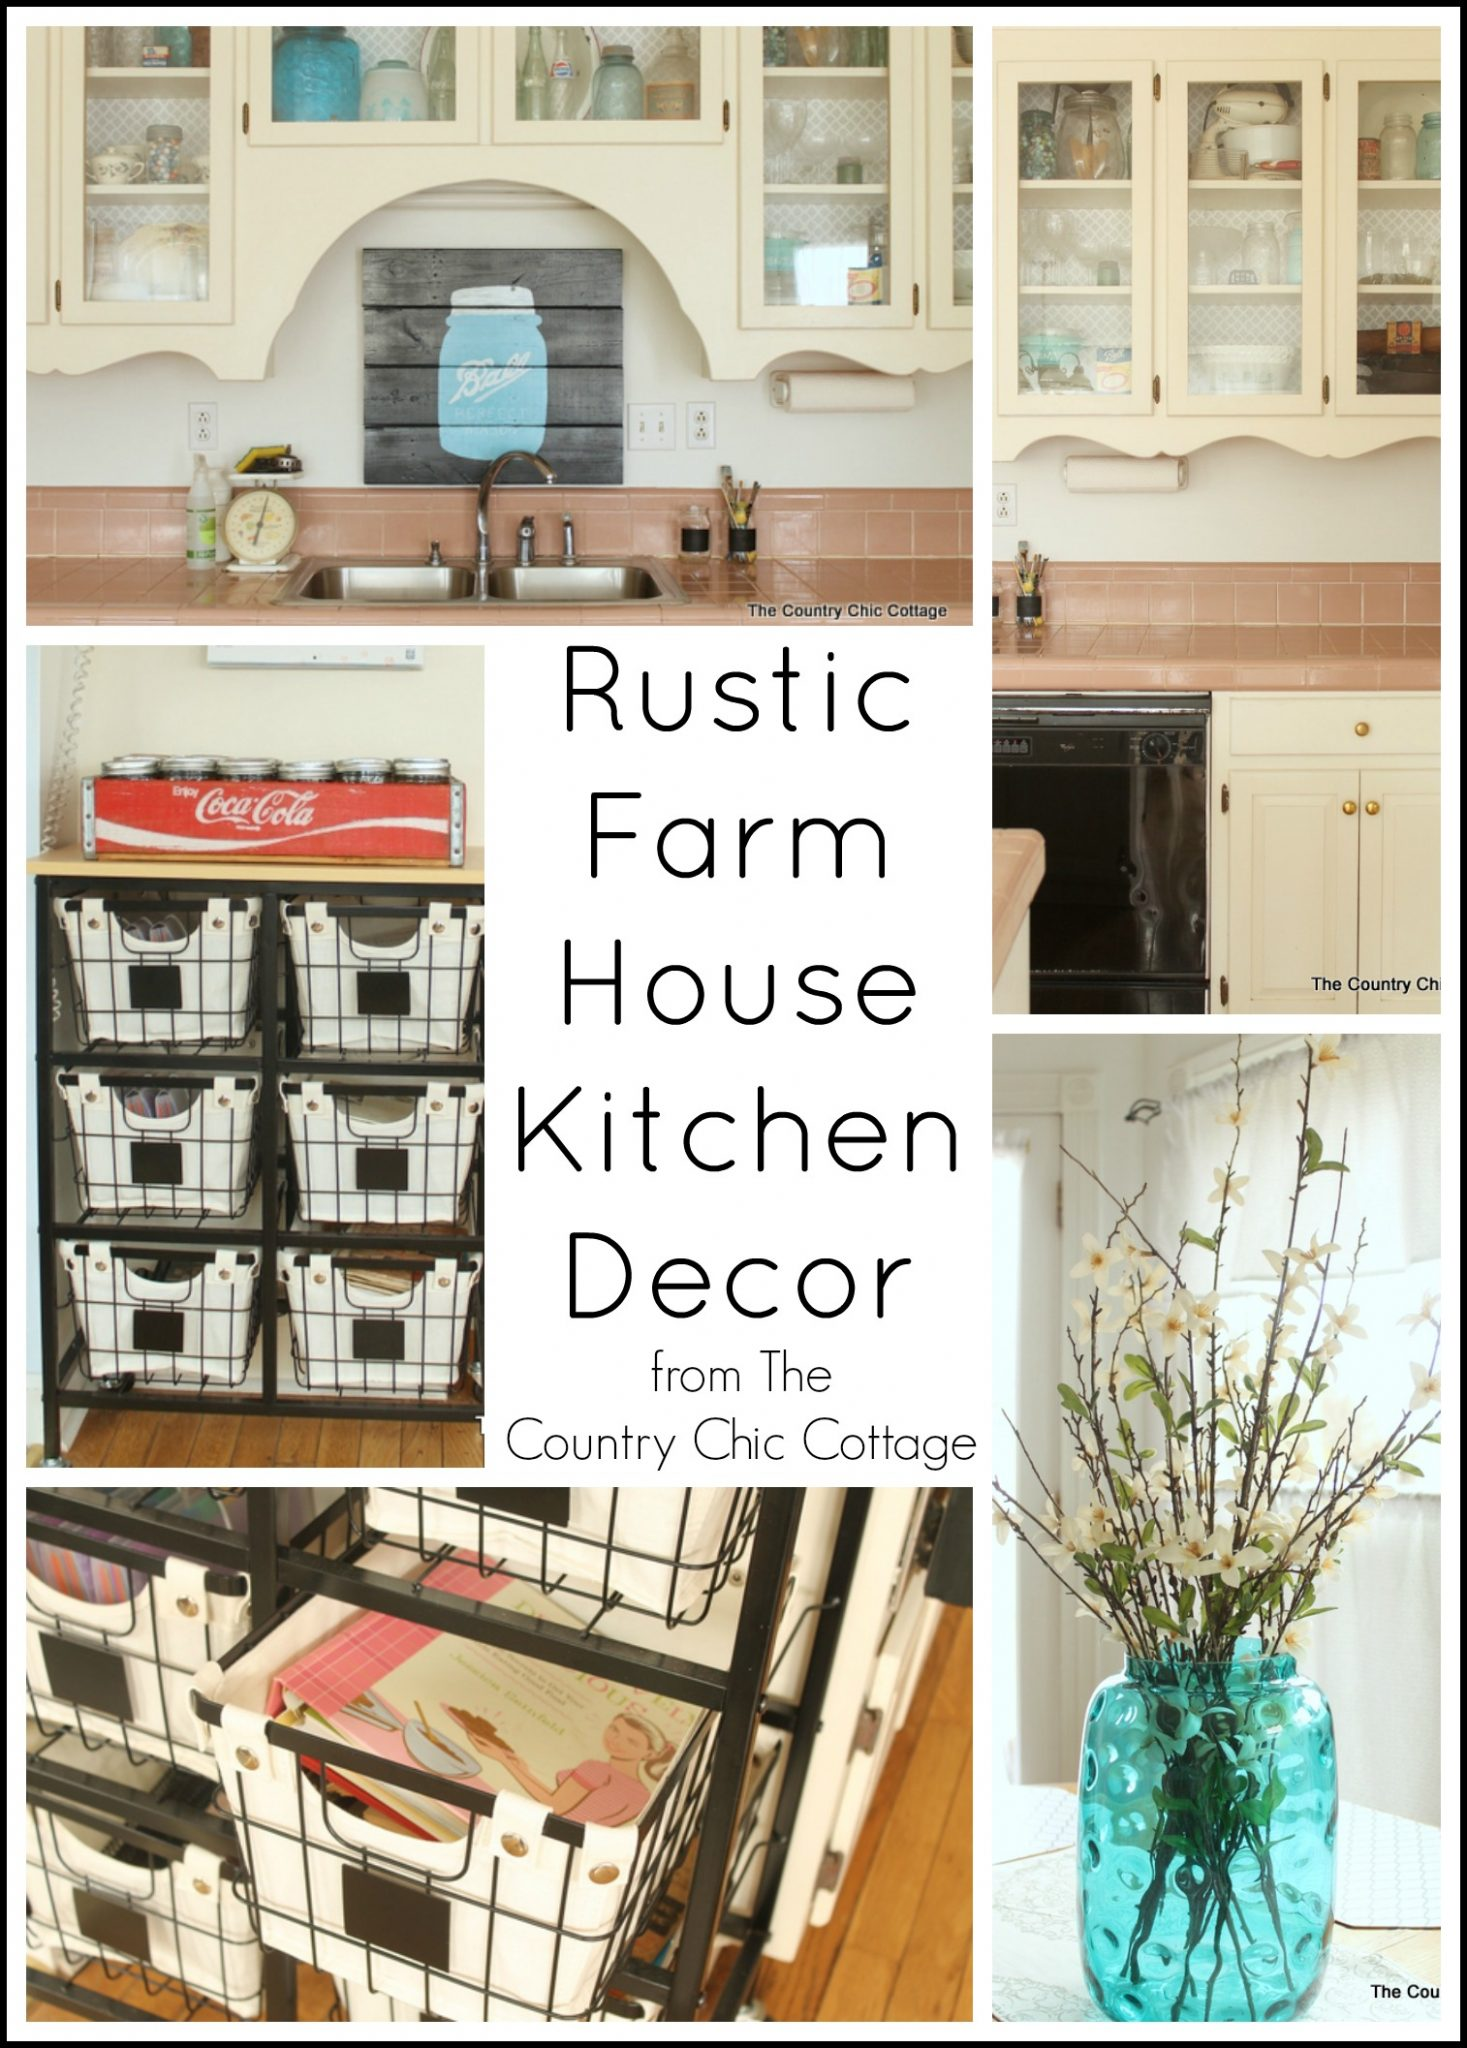 Rustic Farmhouse Kitchen Decor - The Country Chic Cottage on Rustic Farmhouse Kitchen  id=77541